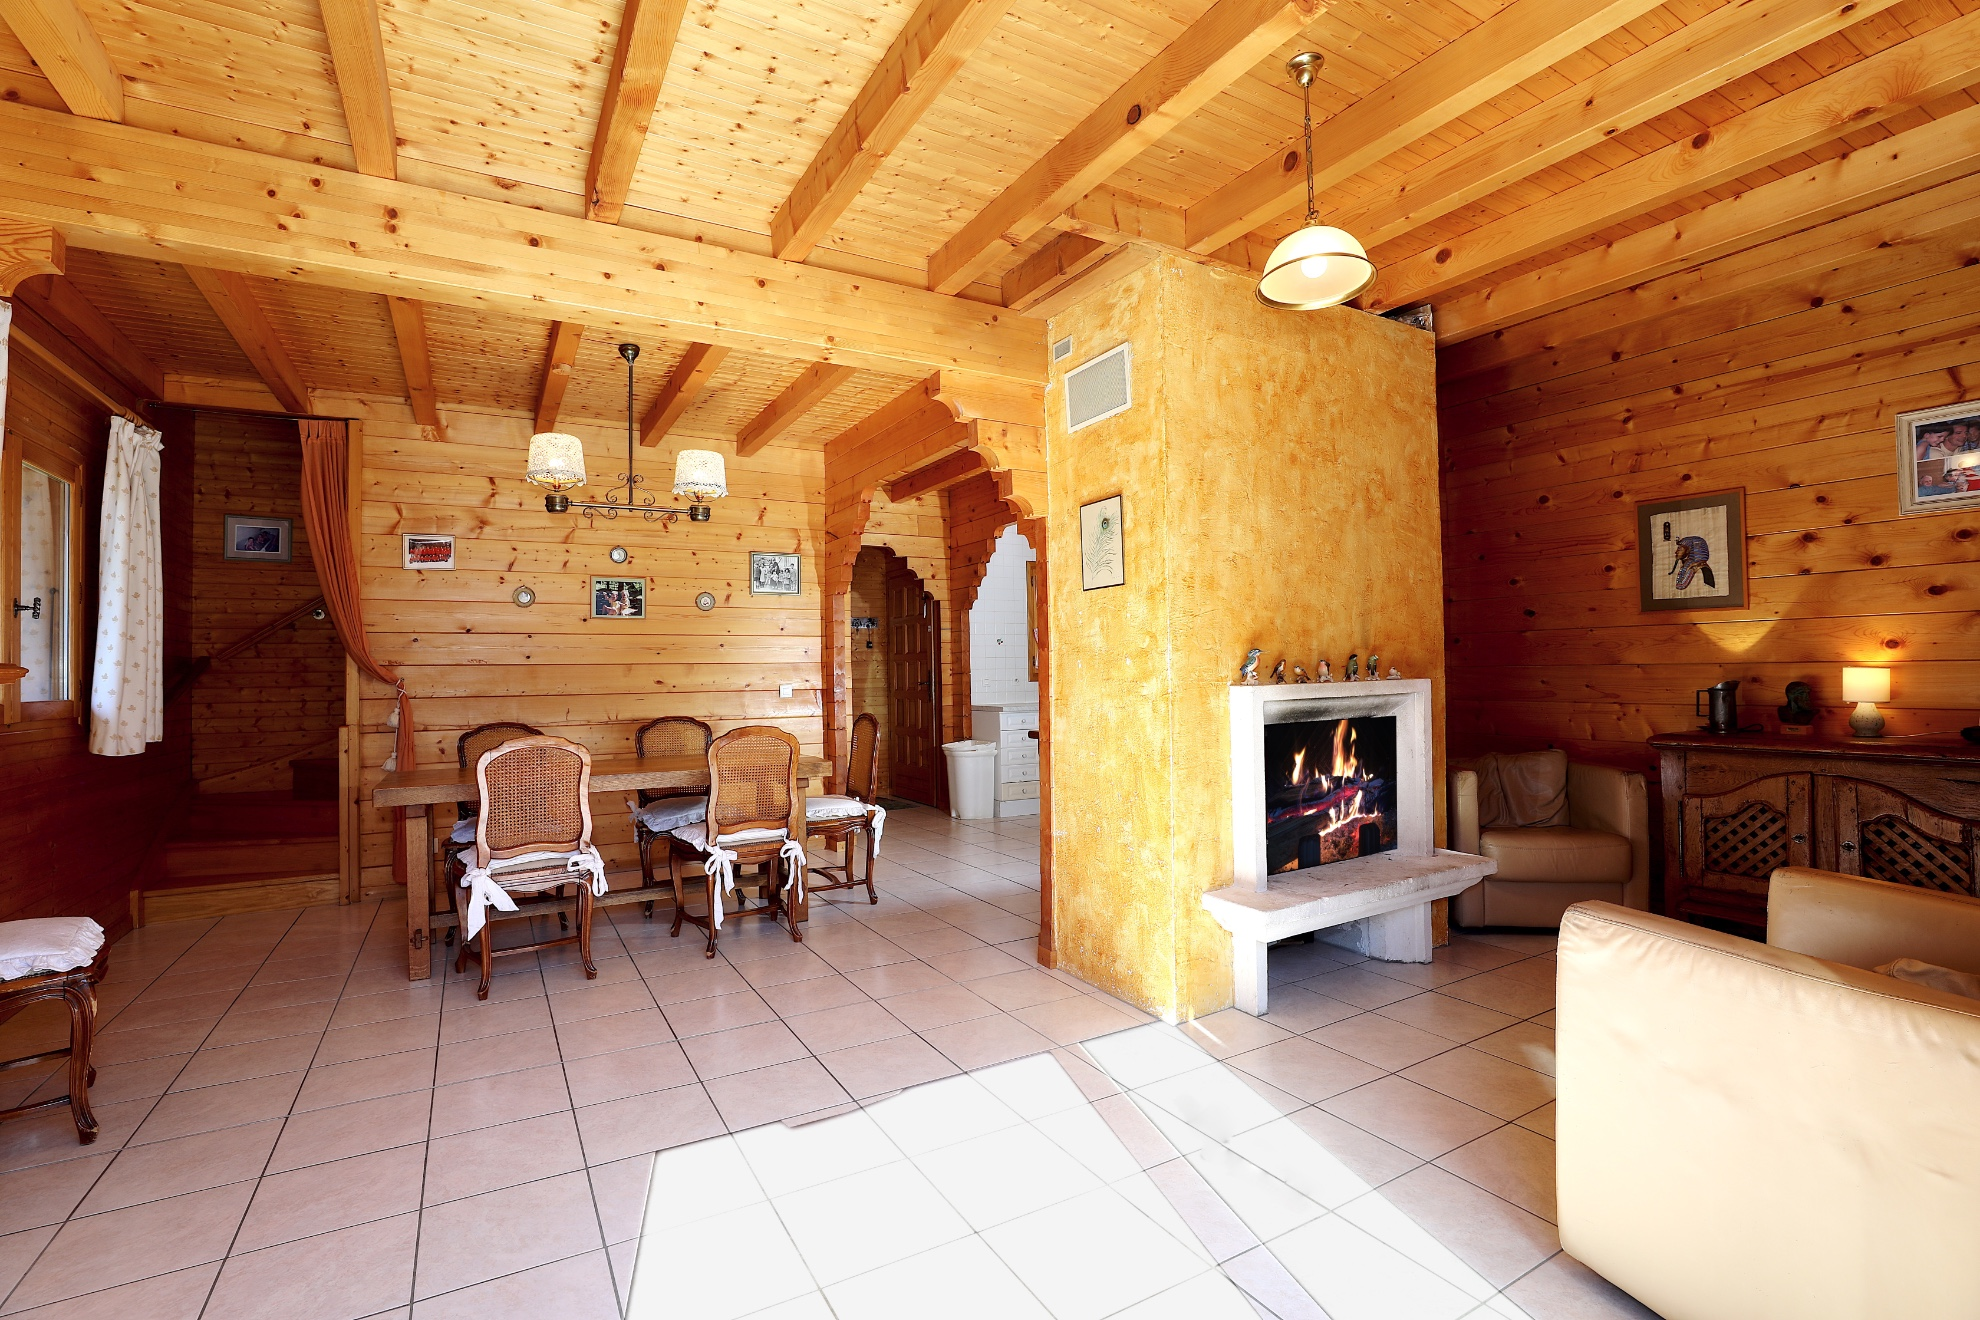 6-room house 220 m²